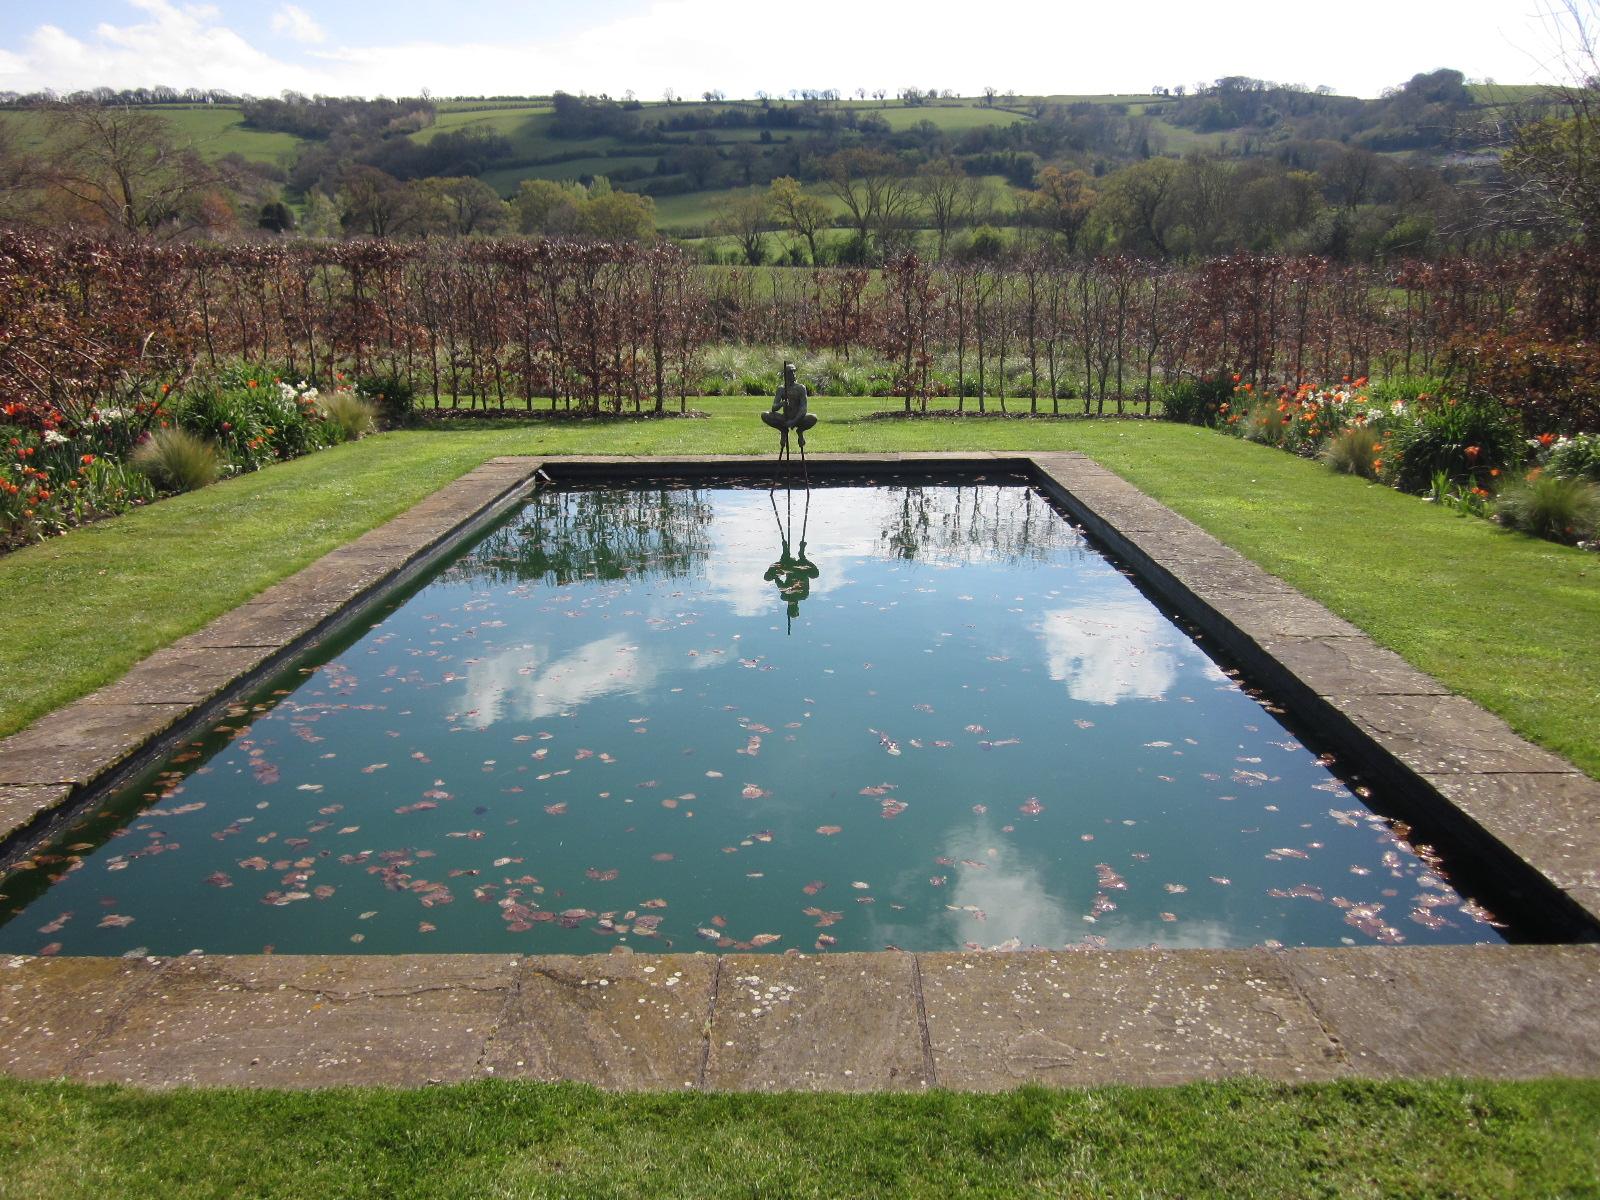 Wordless wednesday reflecting pool - Reflecting pool ...